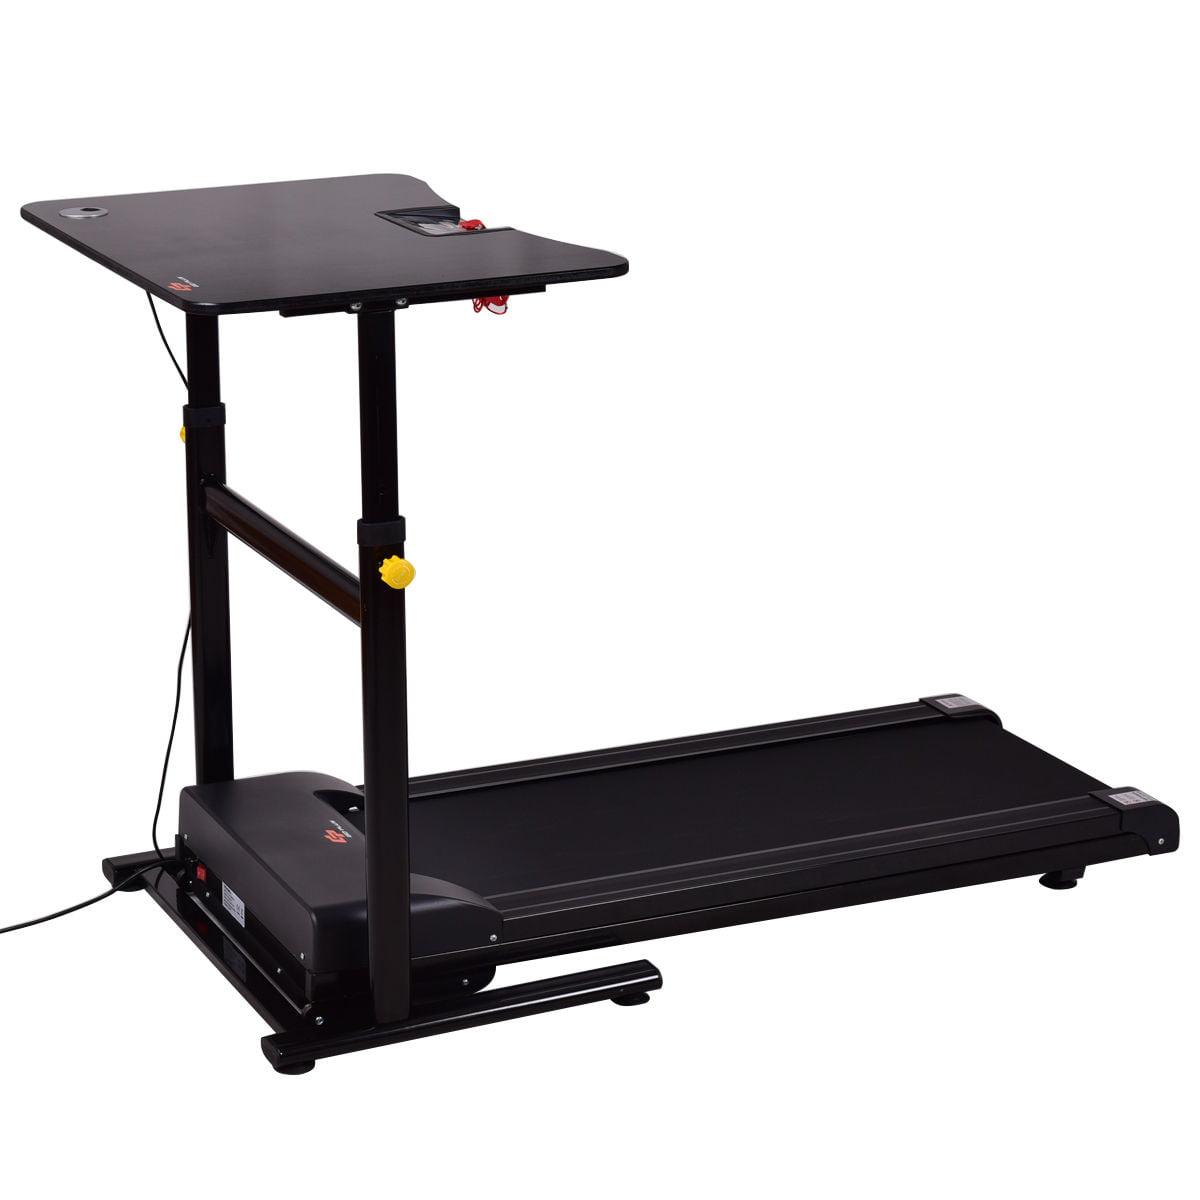 reviews fitness desks net compare treadmill treadmillreviews desk life best